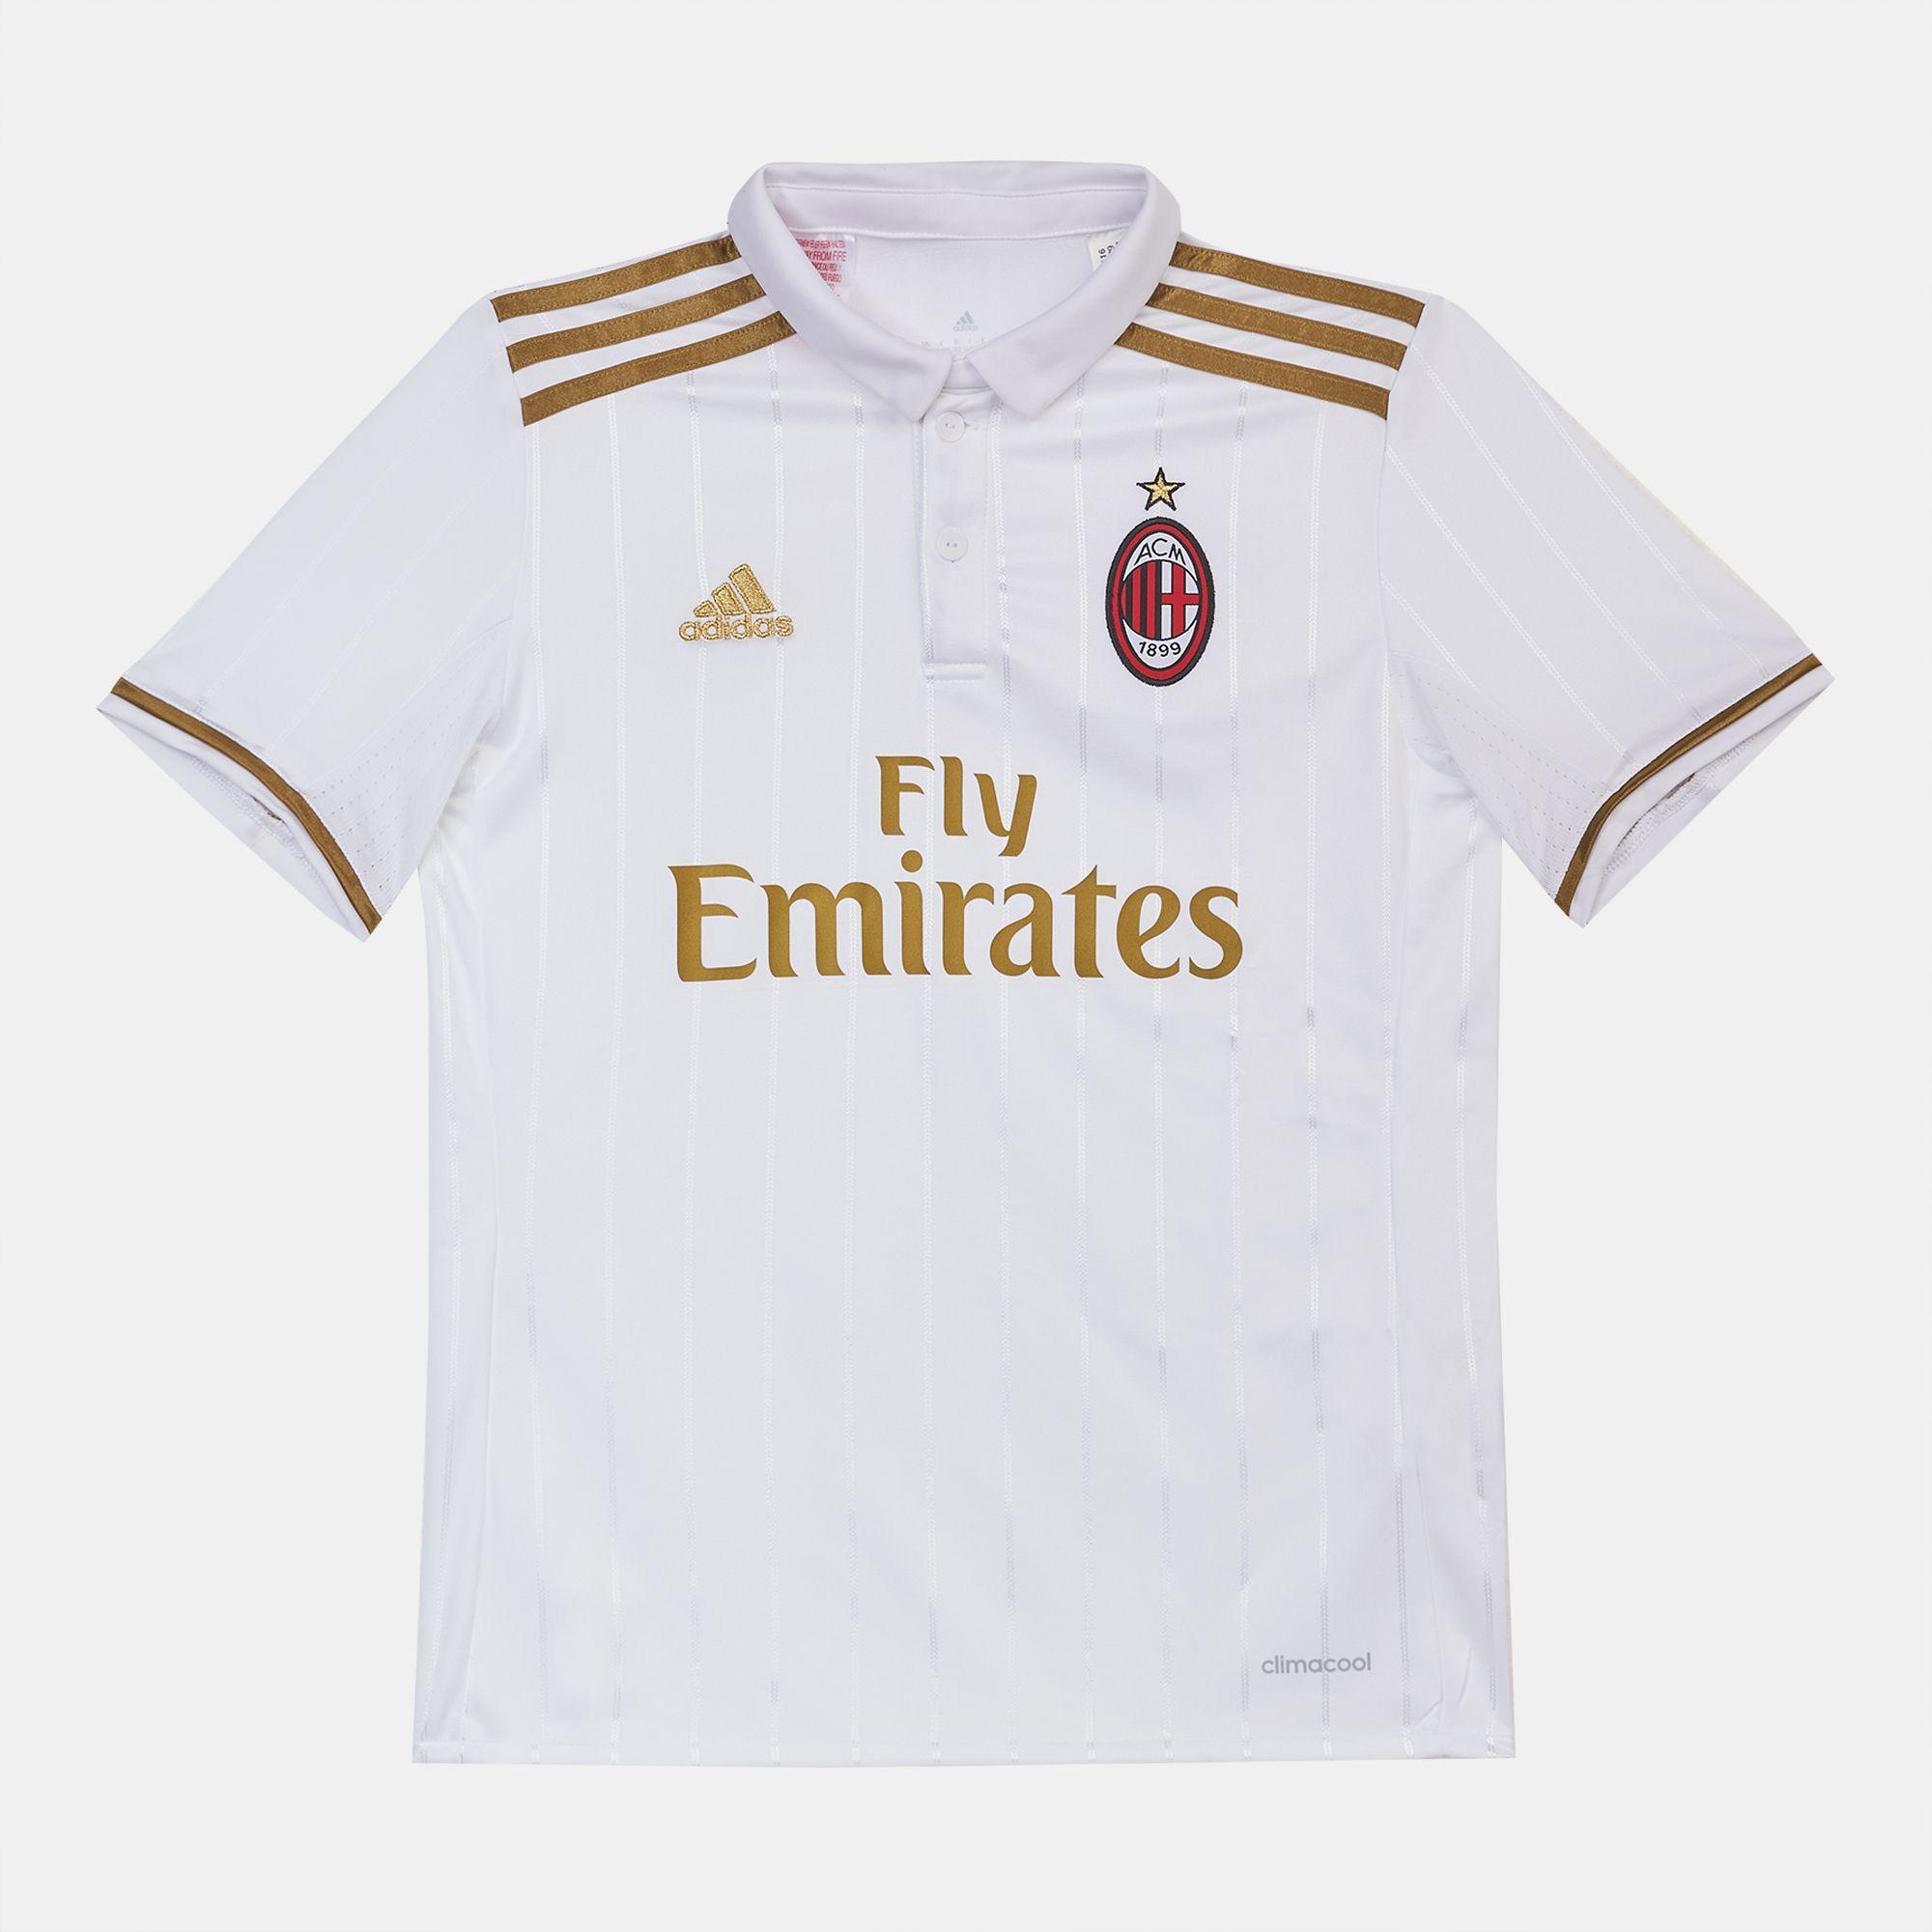 728b2ddbc Shop White adidas Kids' AC Milan Replica Away Football Jersey for Kids by  adidas | SSS